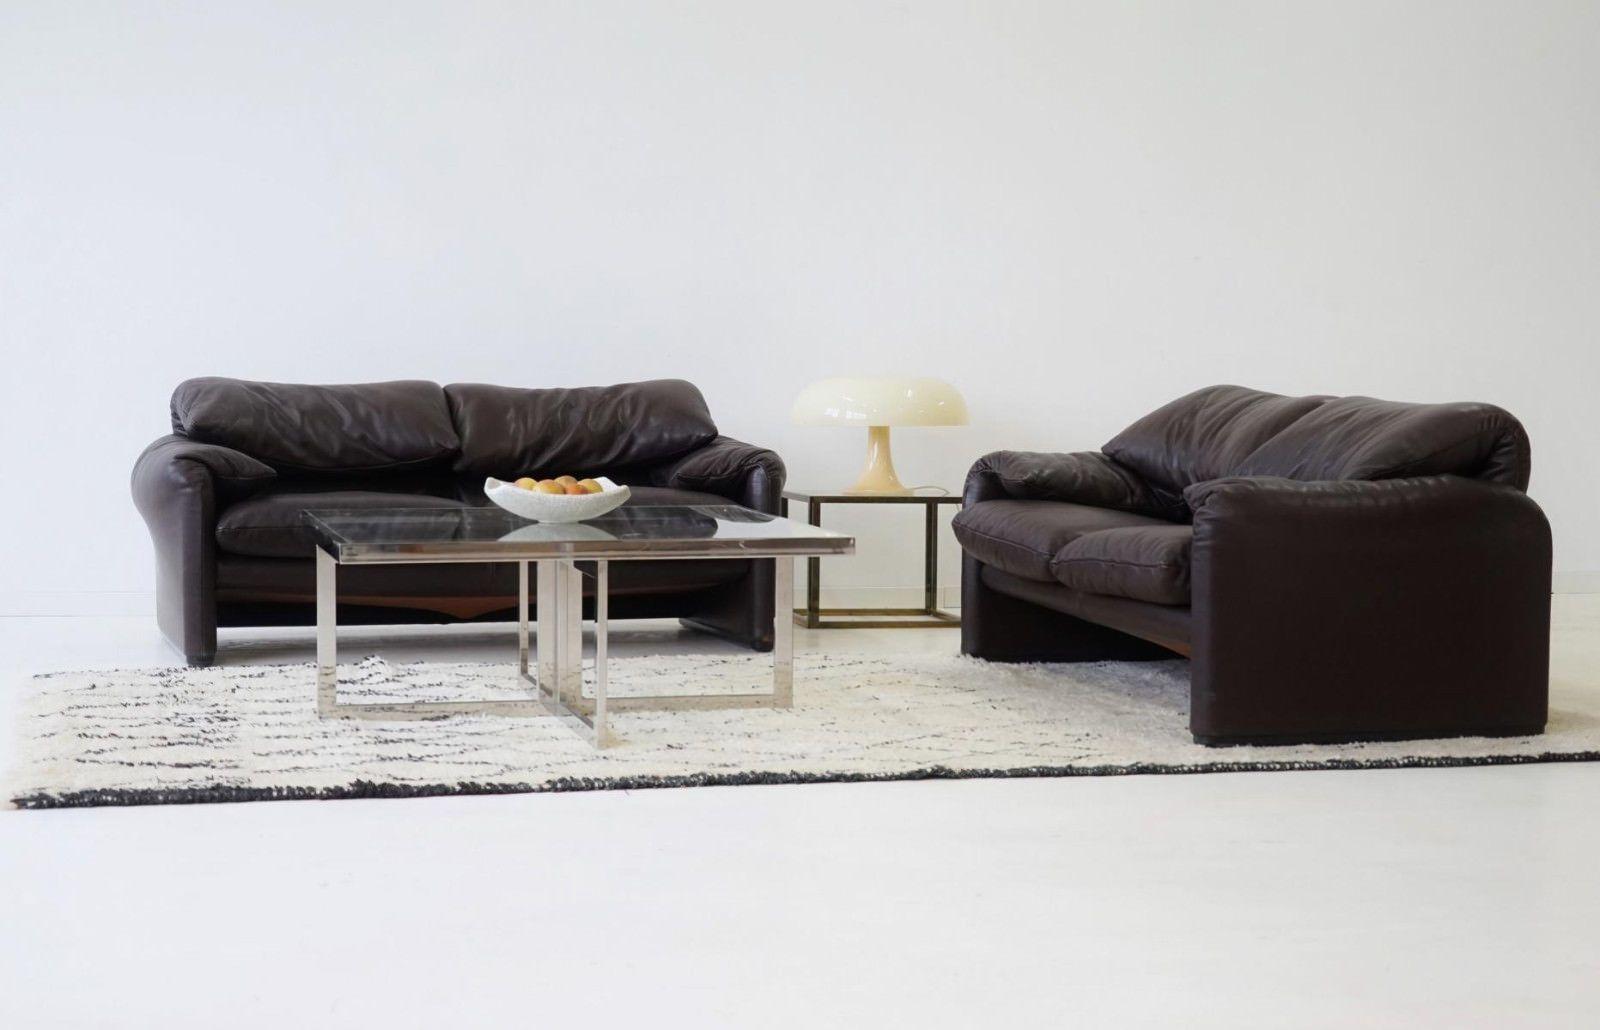 2x Cassina Maralunga 2 Sitzer Sofa Vico Magestretti Canapé Designklassiker Leder